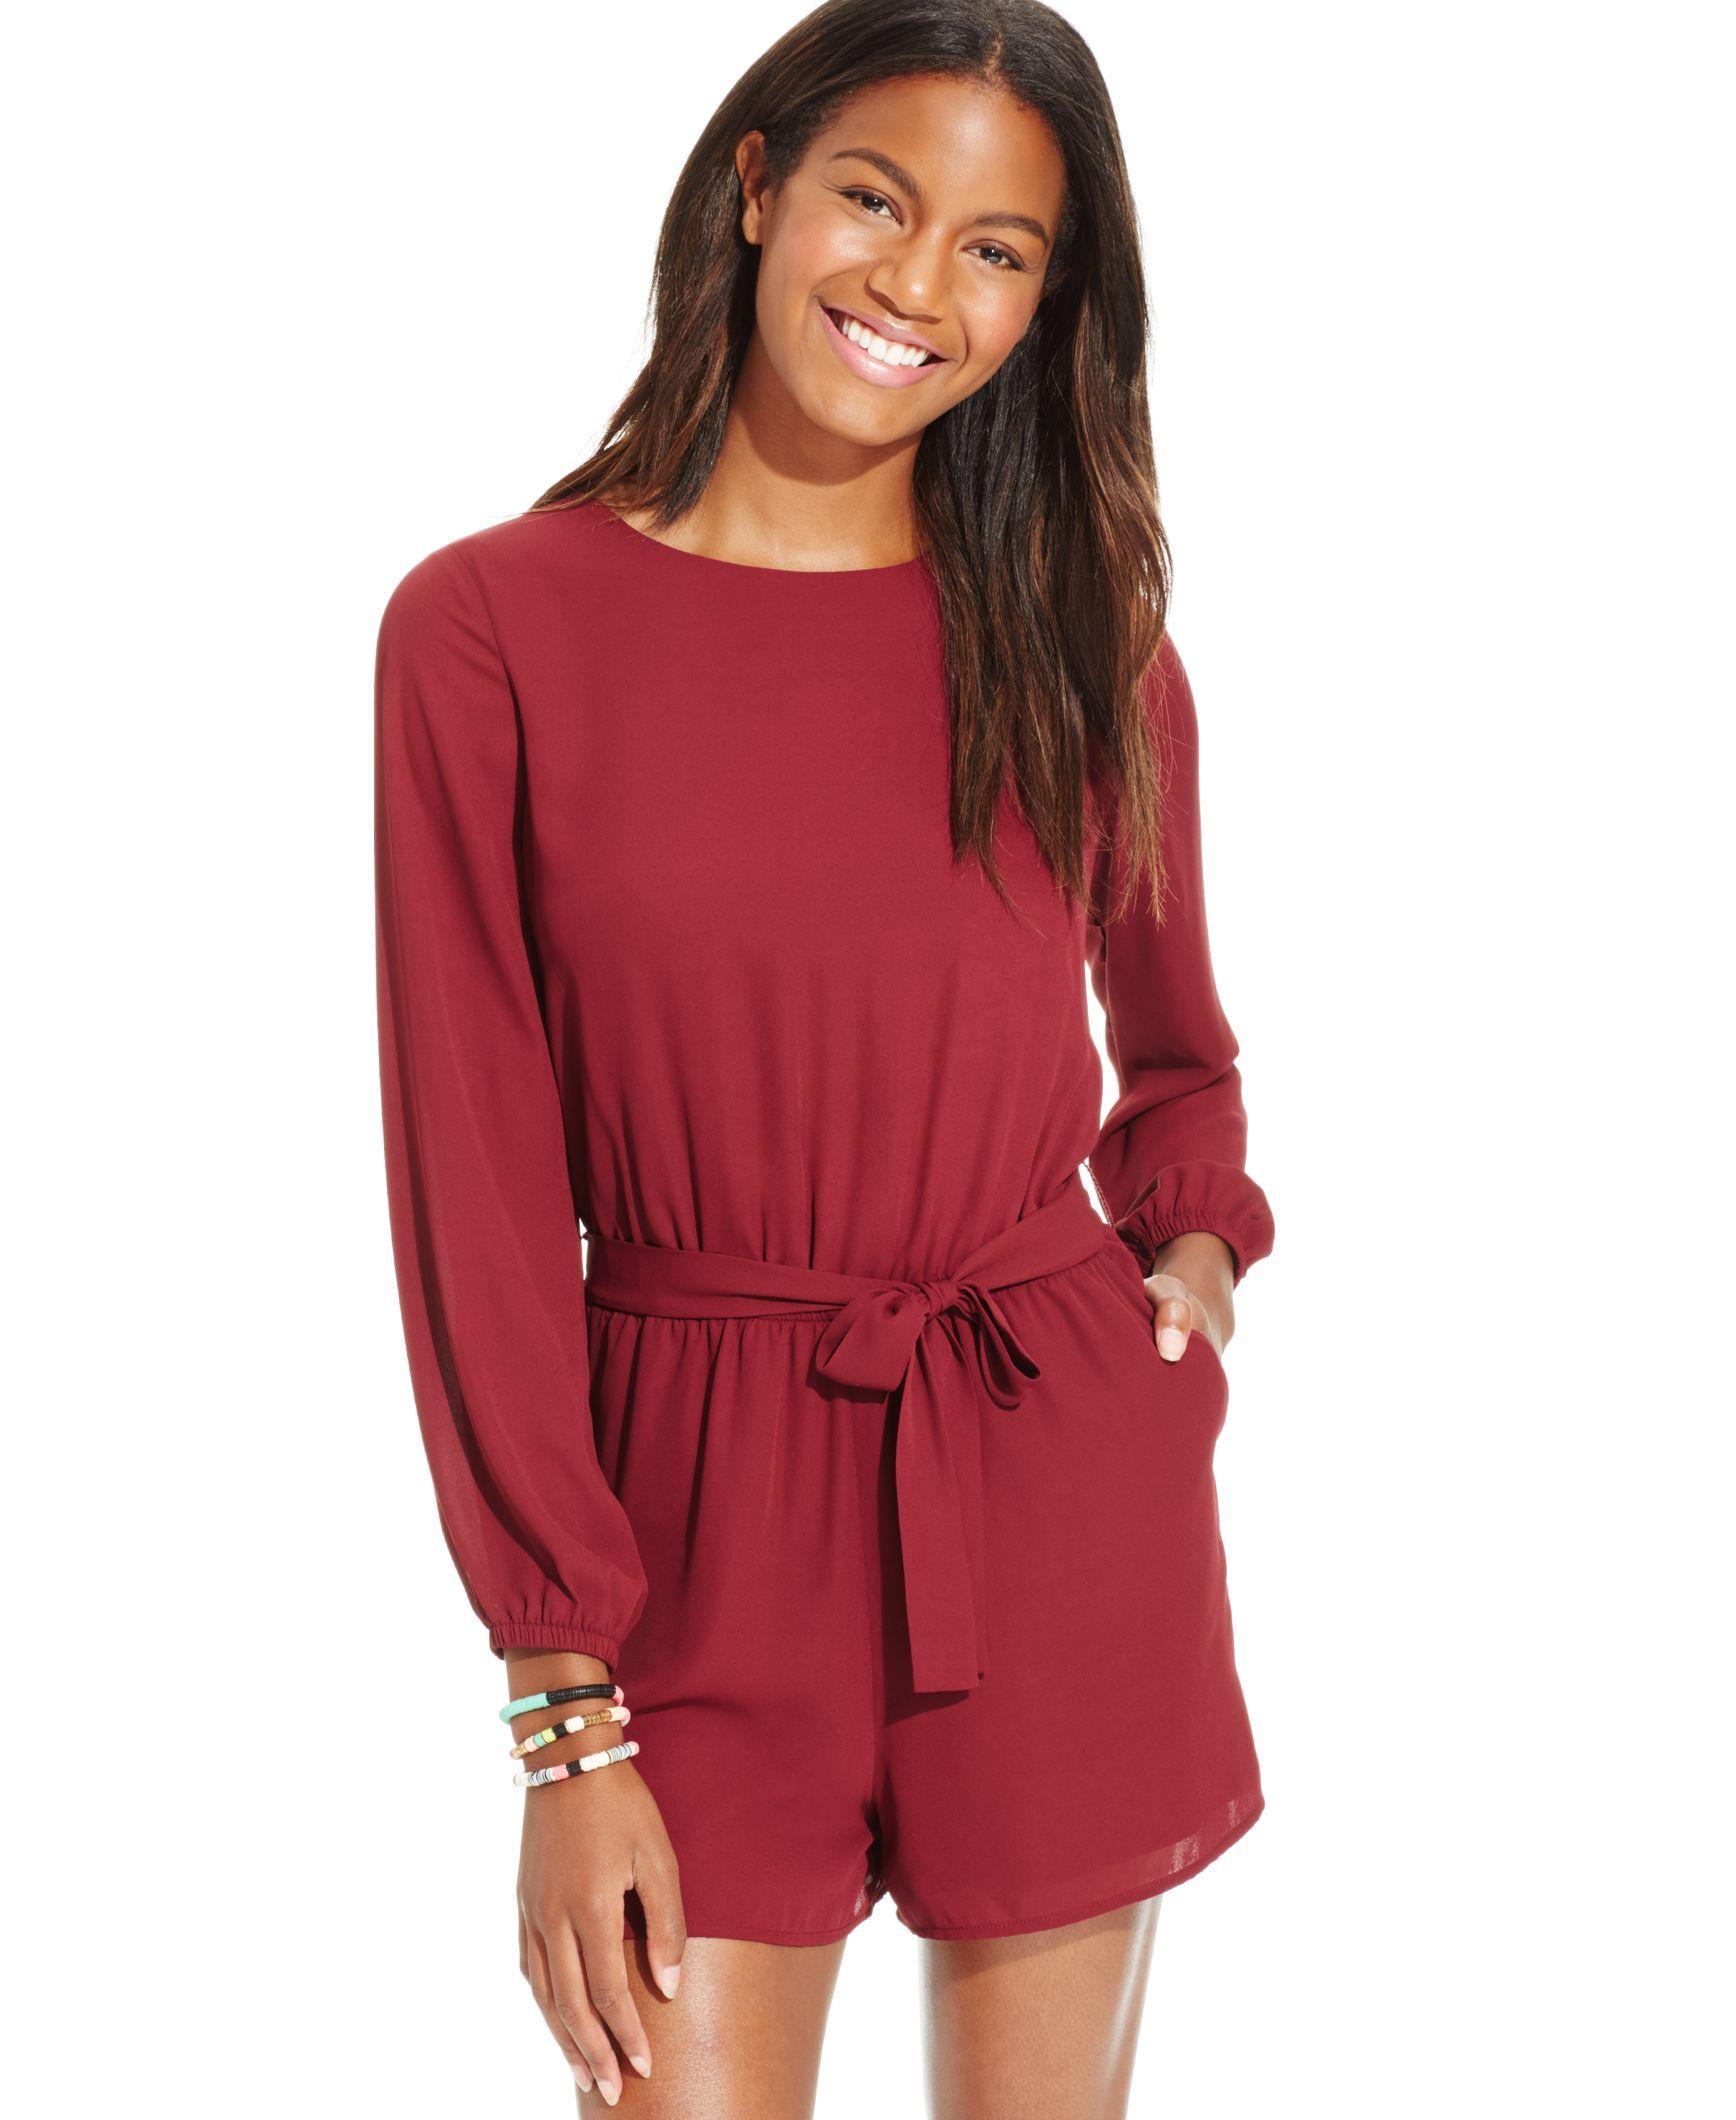 One Clothing Juniorsu0026#39; Long-Sleeve Sash Romper - Juniors Jumpsuits U0026 Rompers - Macyu0026#39;s | Fashion ...